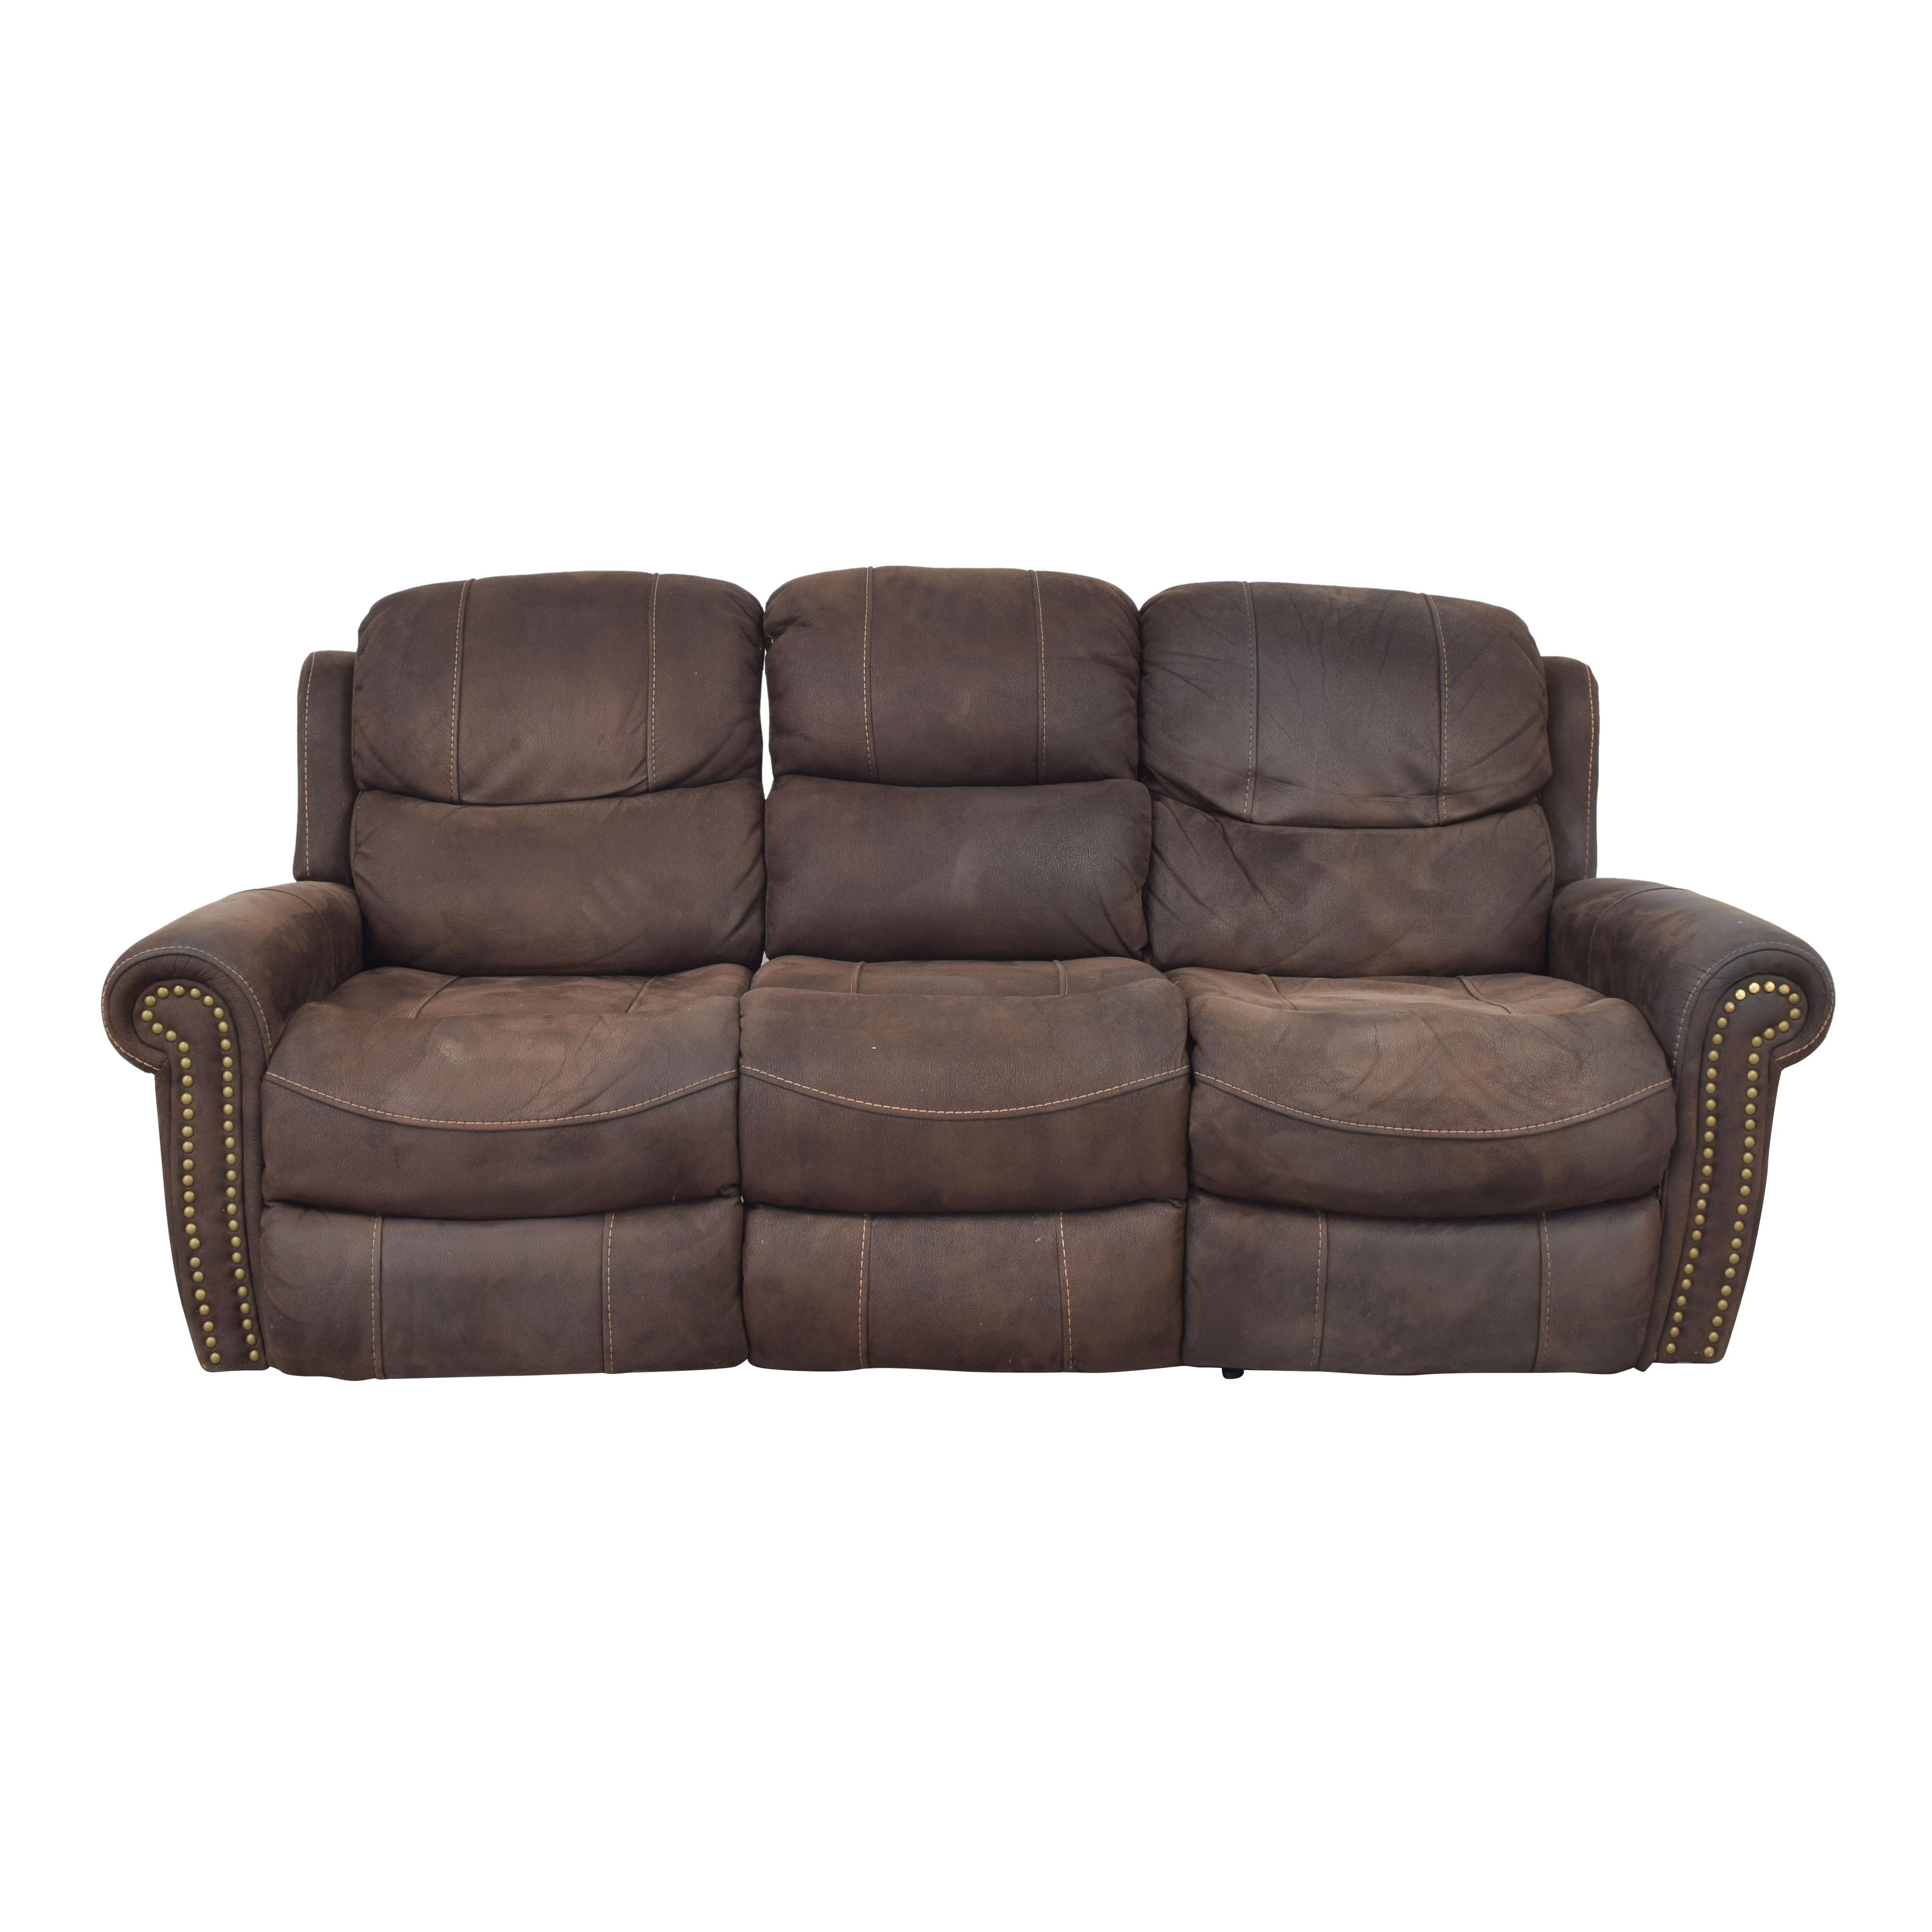 Macy's Recliner Sofa / Classic Sofas